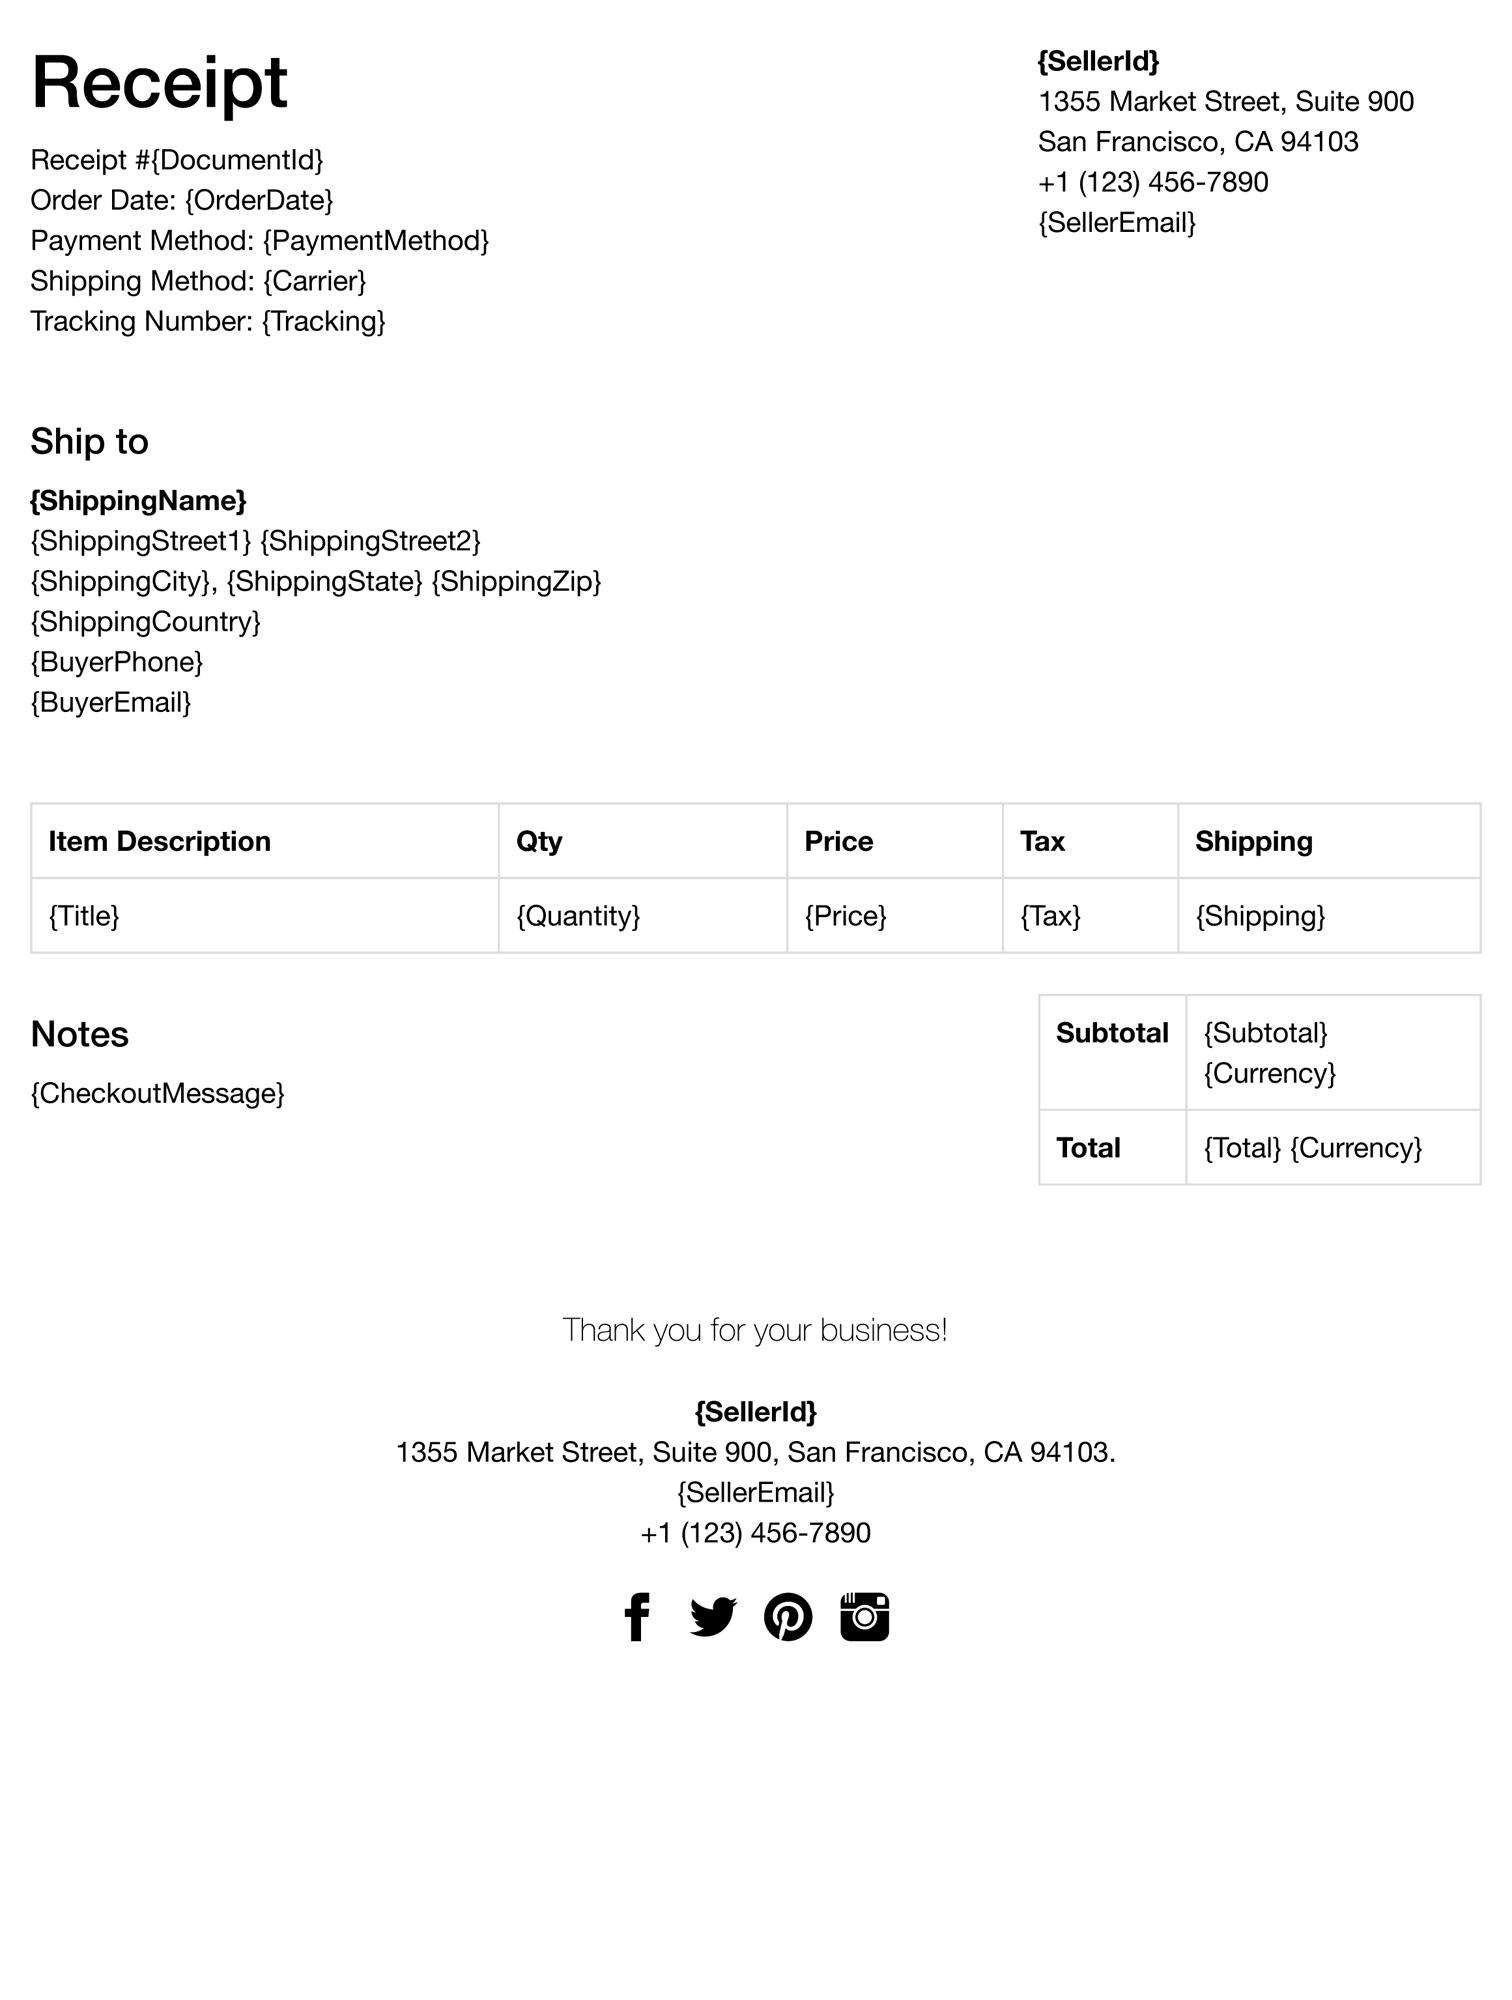 eBay receipt template